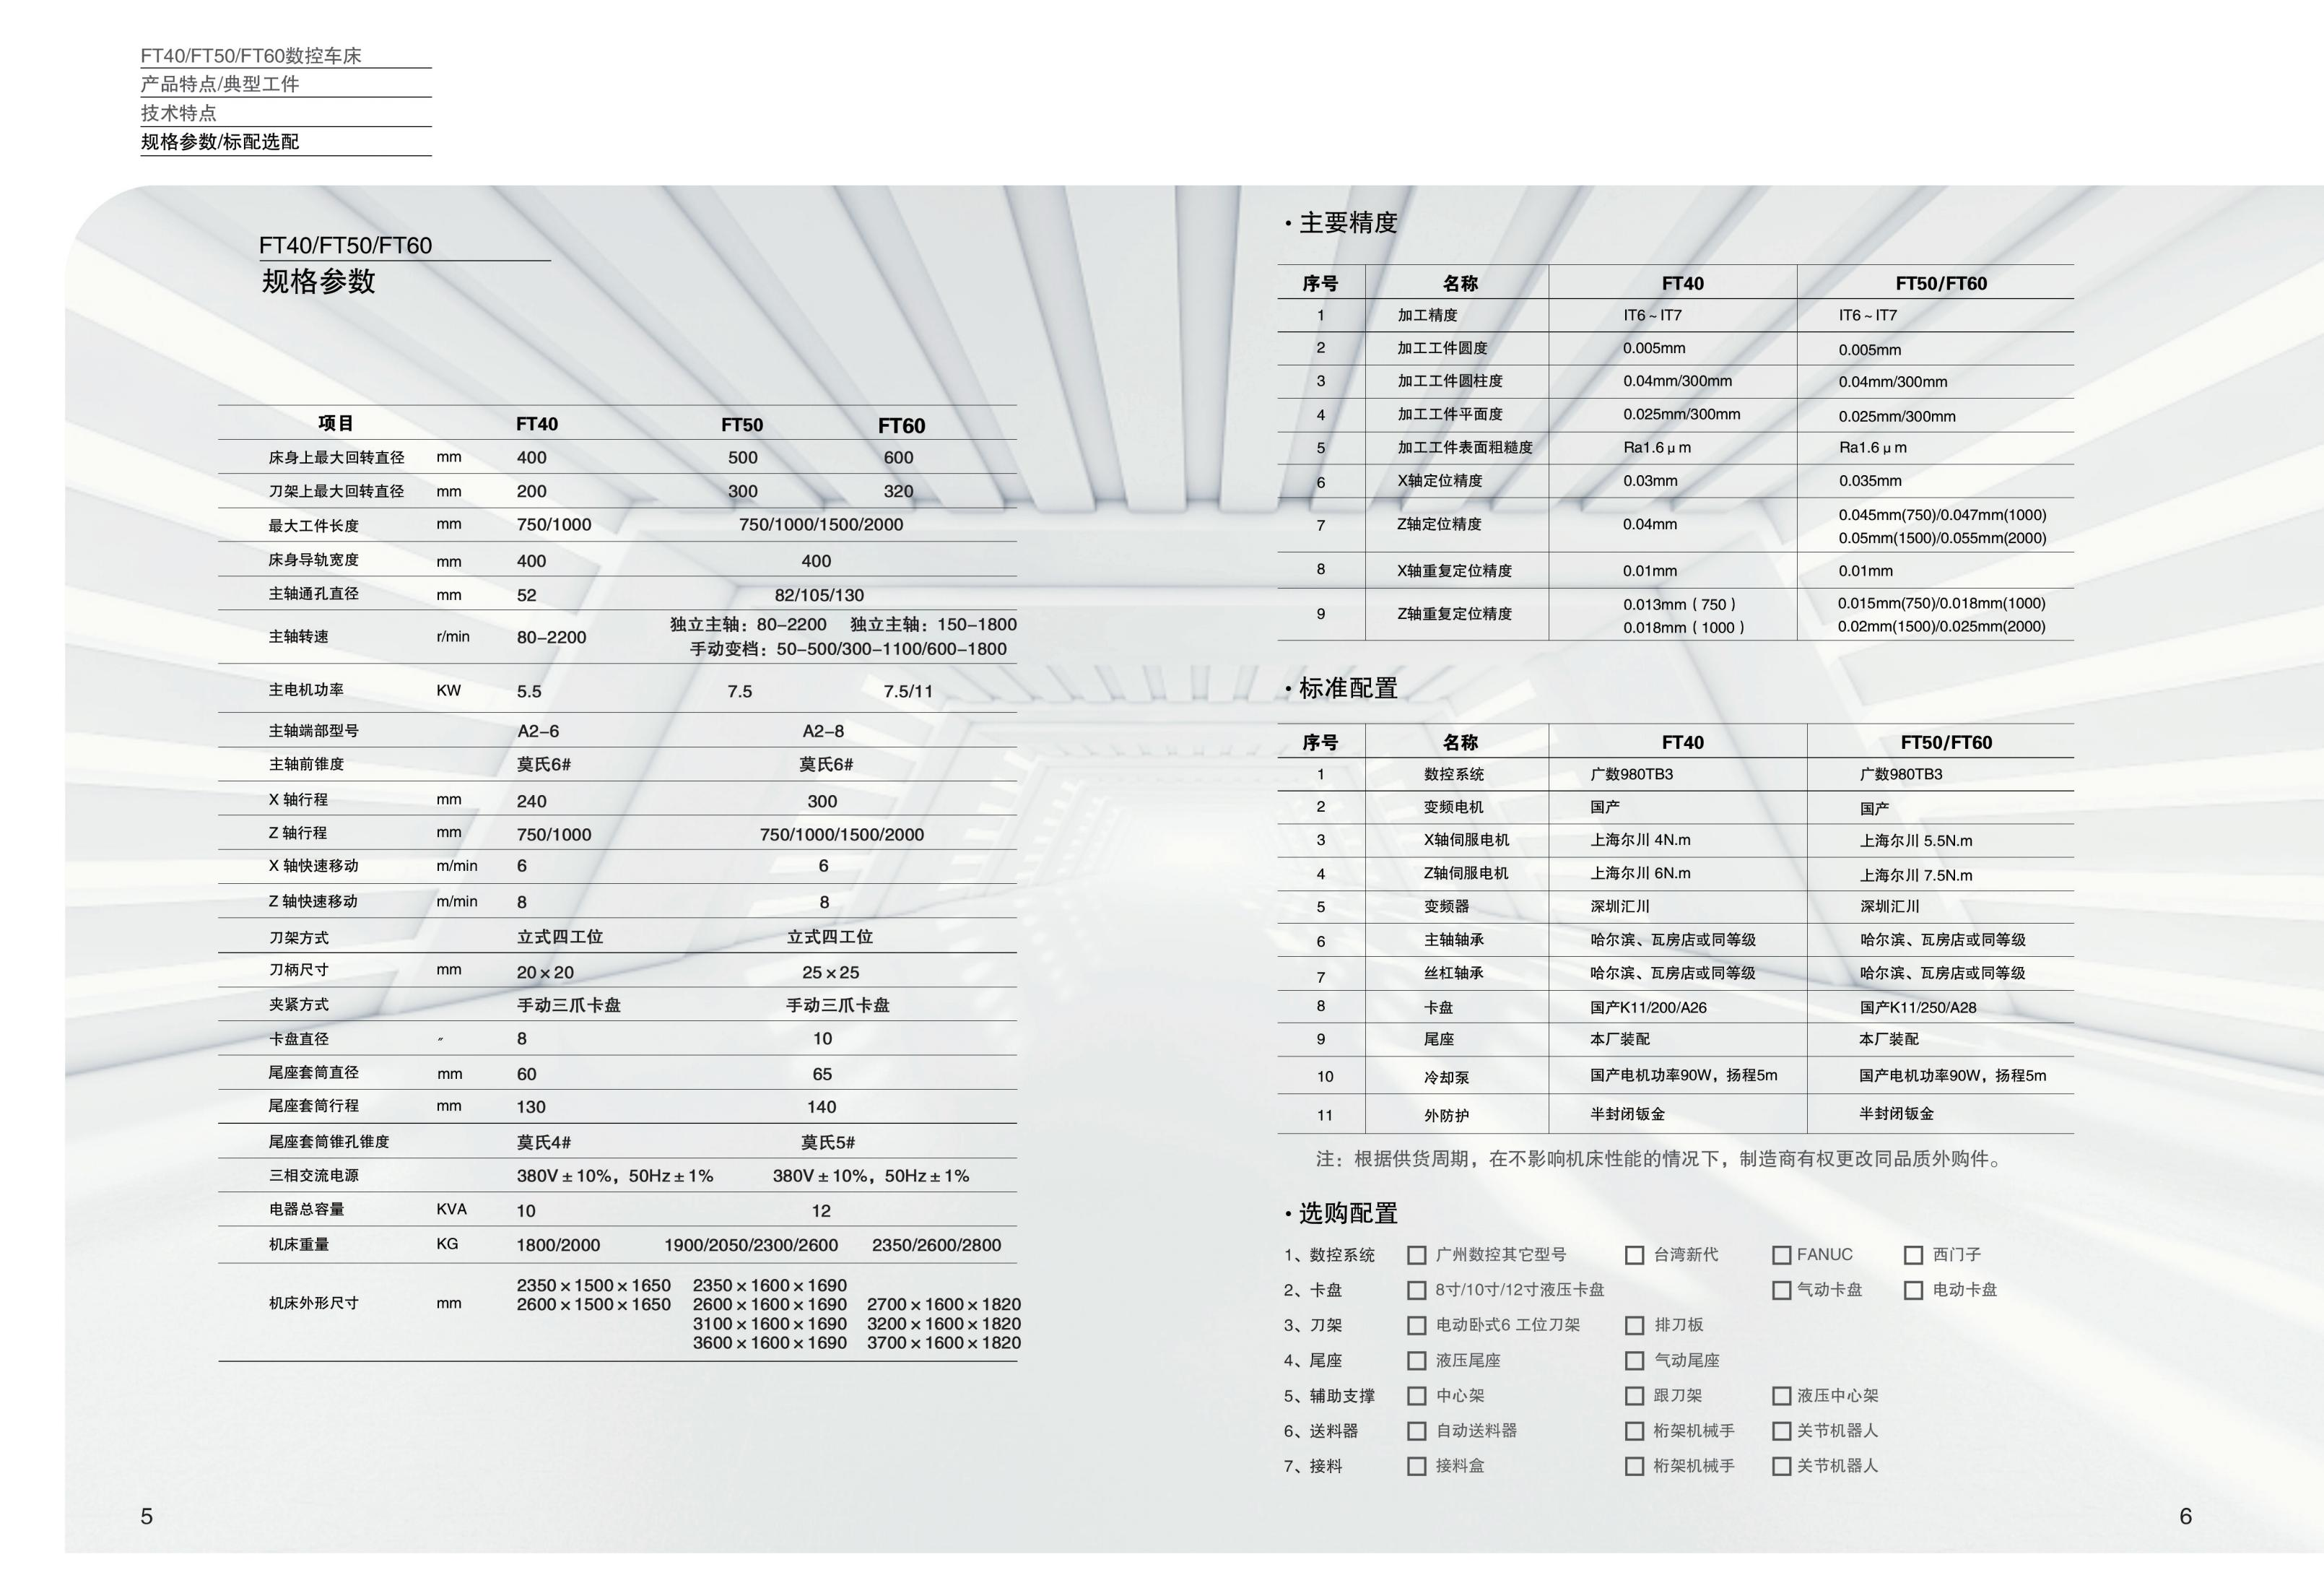 FT系列经典数控车床样册(2021.V1.1)_03.jpg